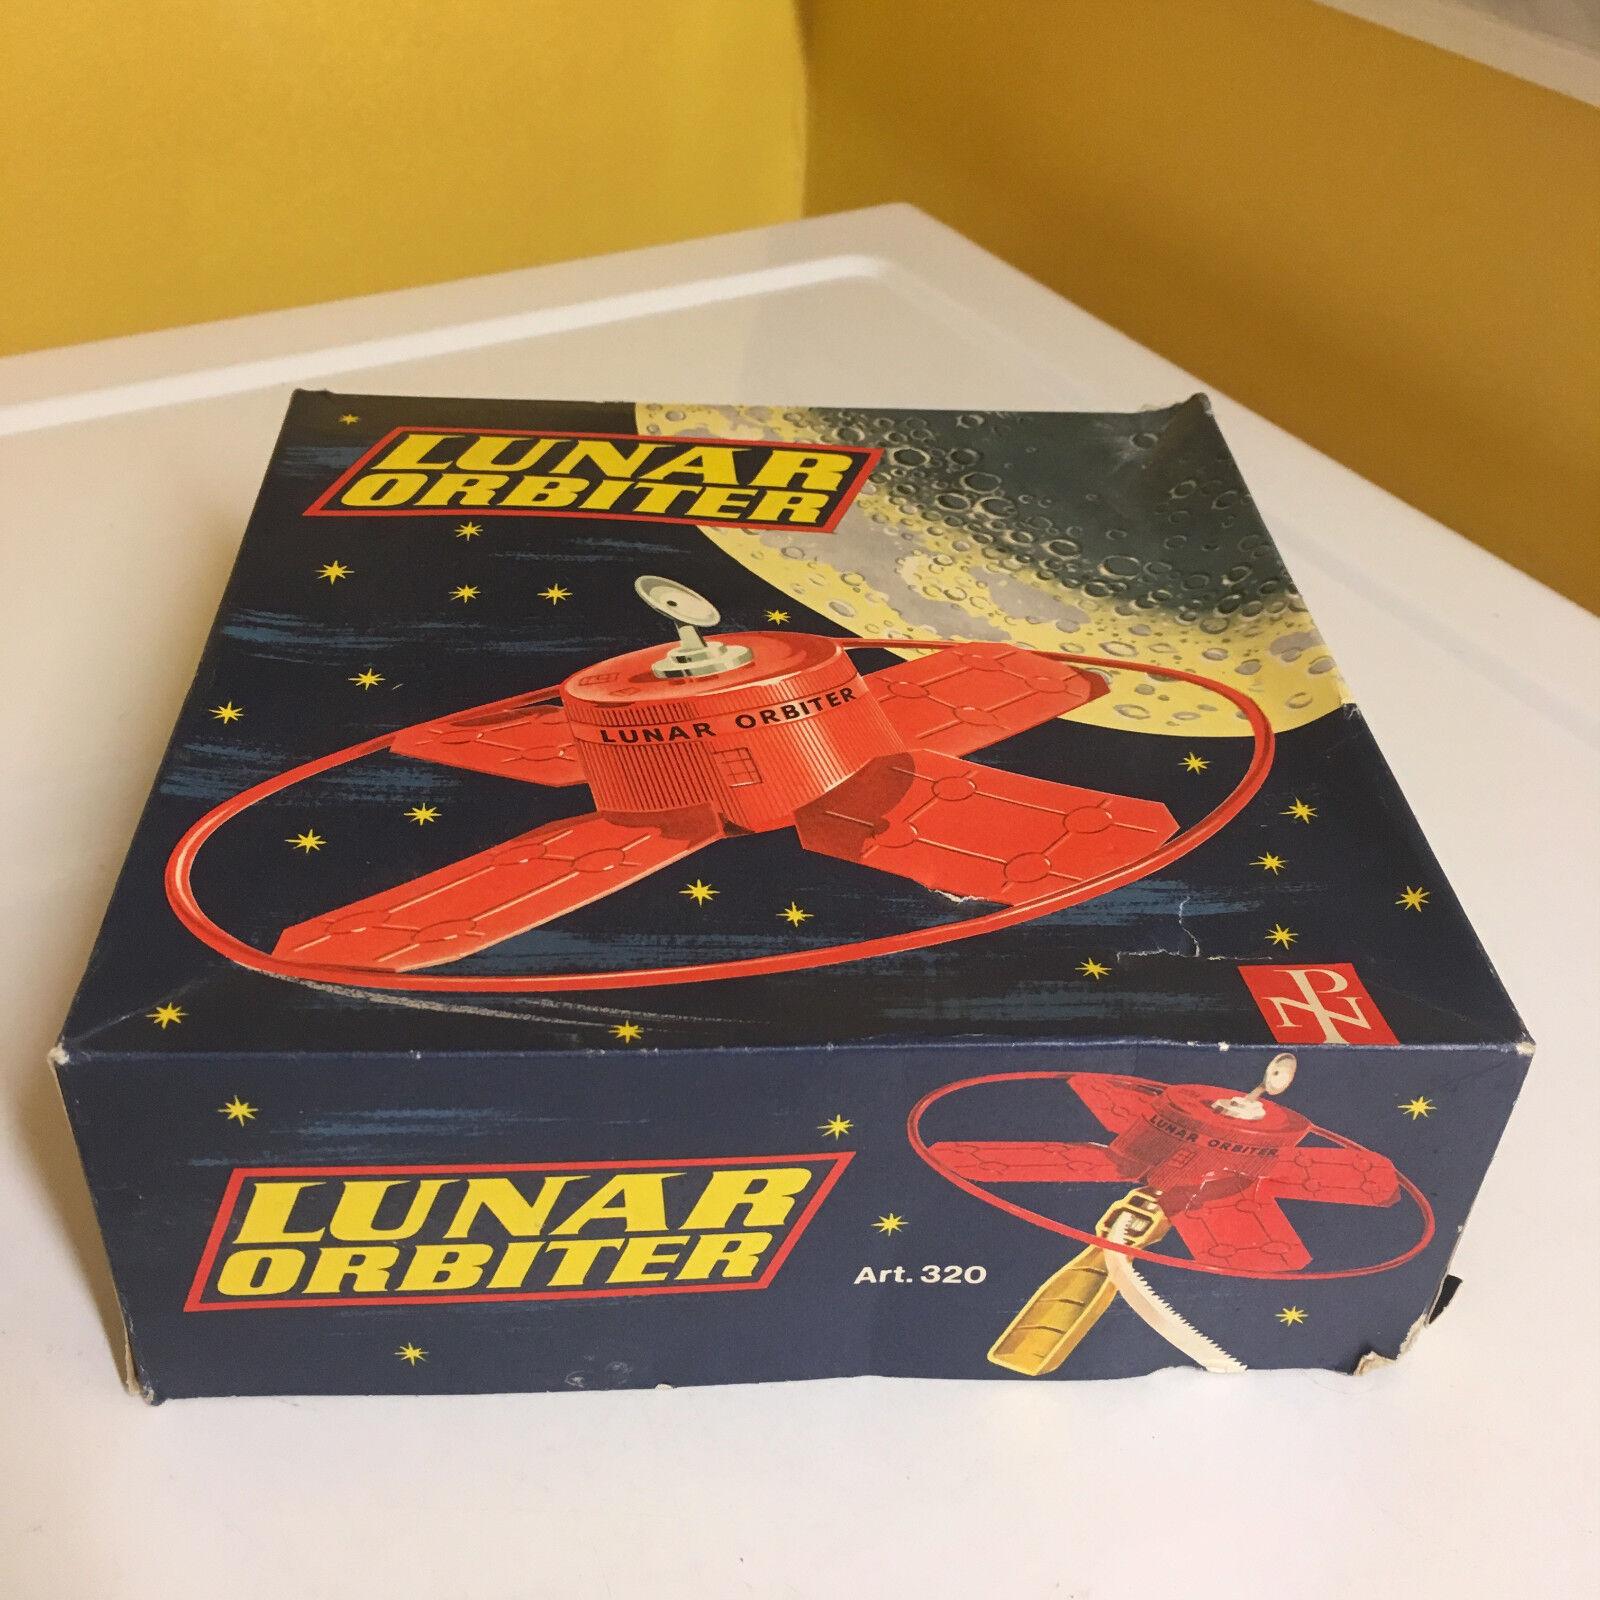 VINTAGE NOS NOS NOS PHILIP NIEDERMEIER NASA 320 LUNAR ORBITER. UNUSED IN ORIGINAL BOX   631e49